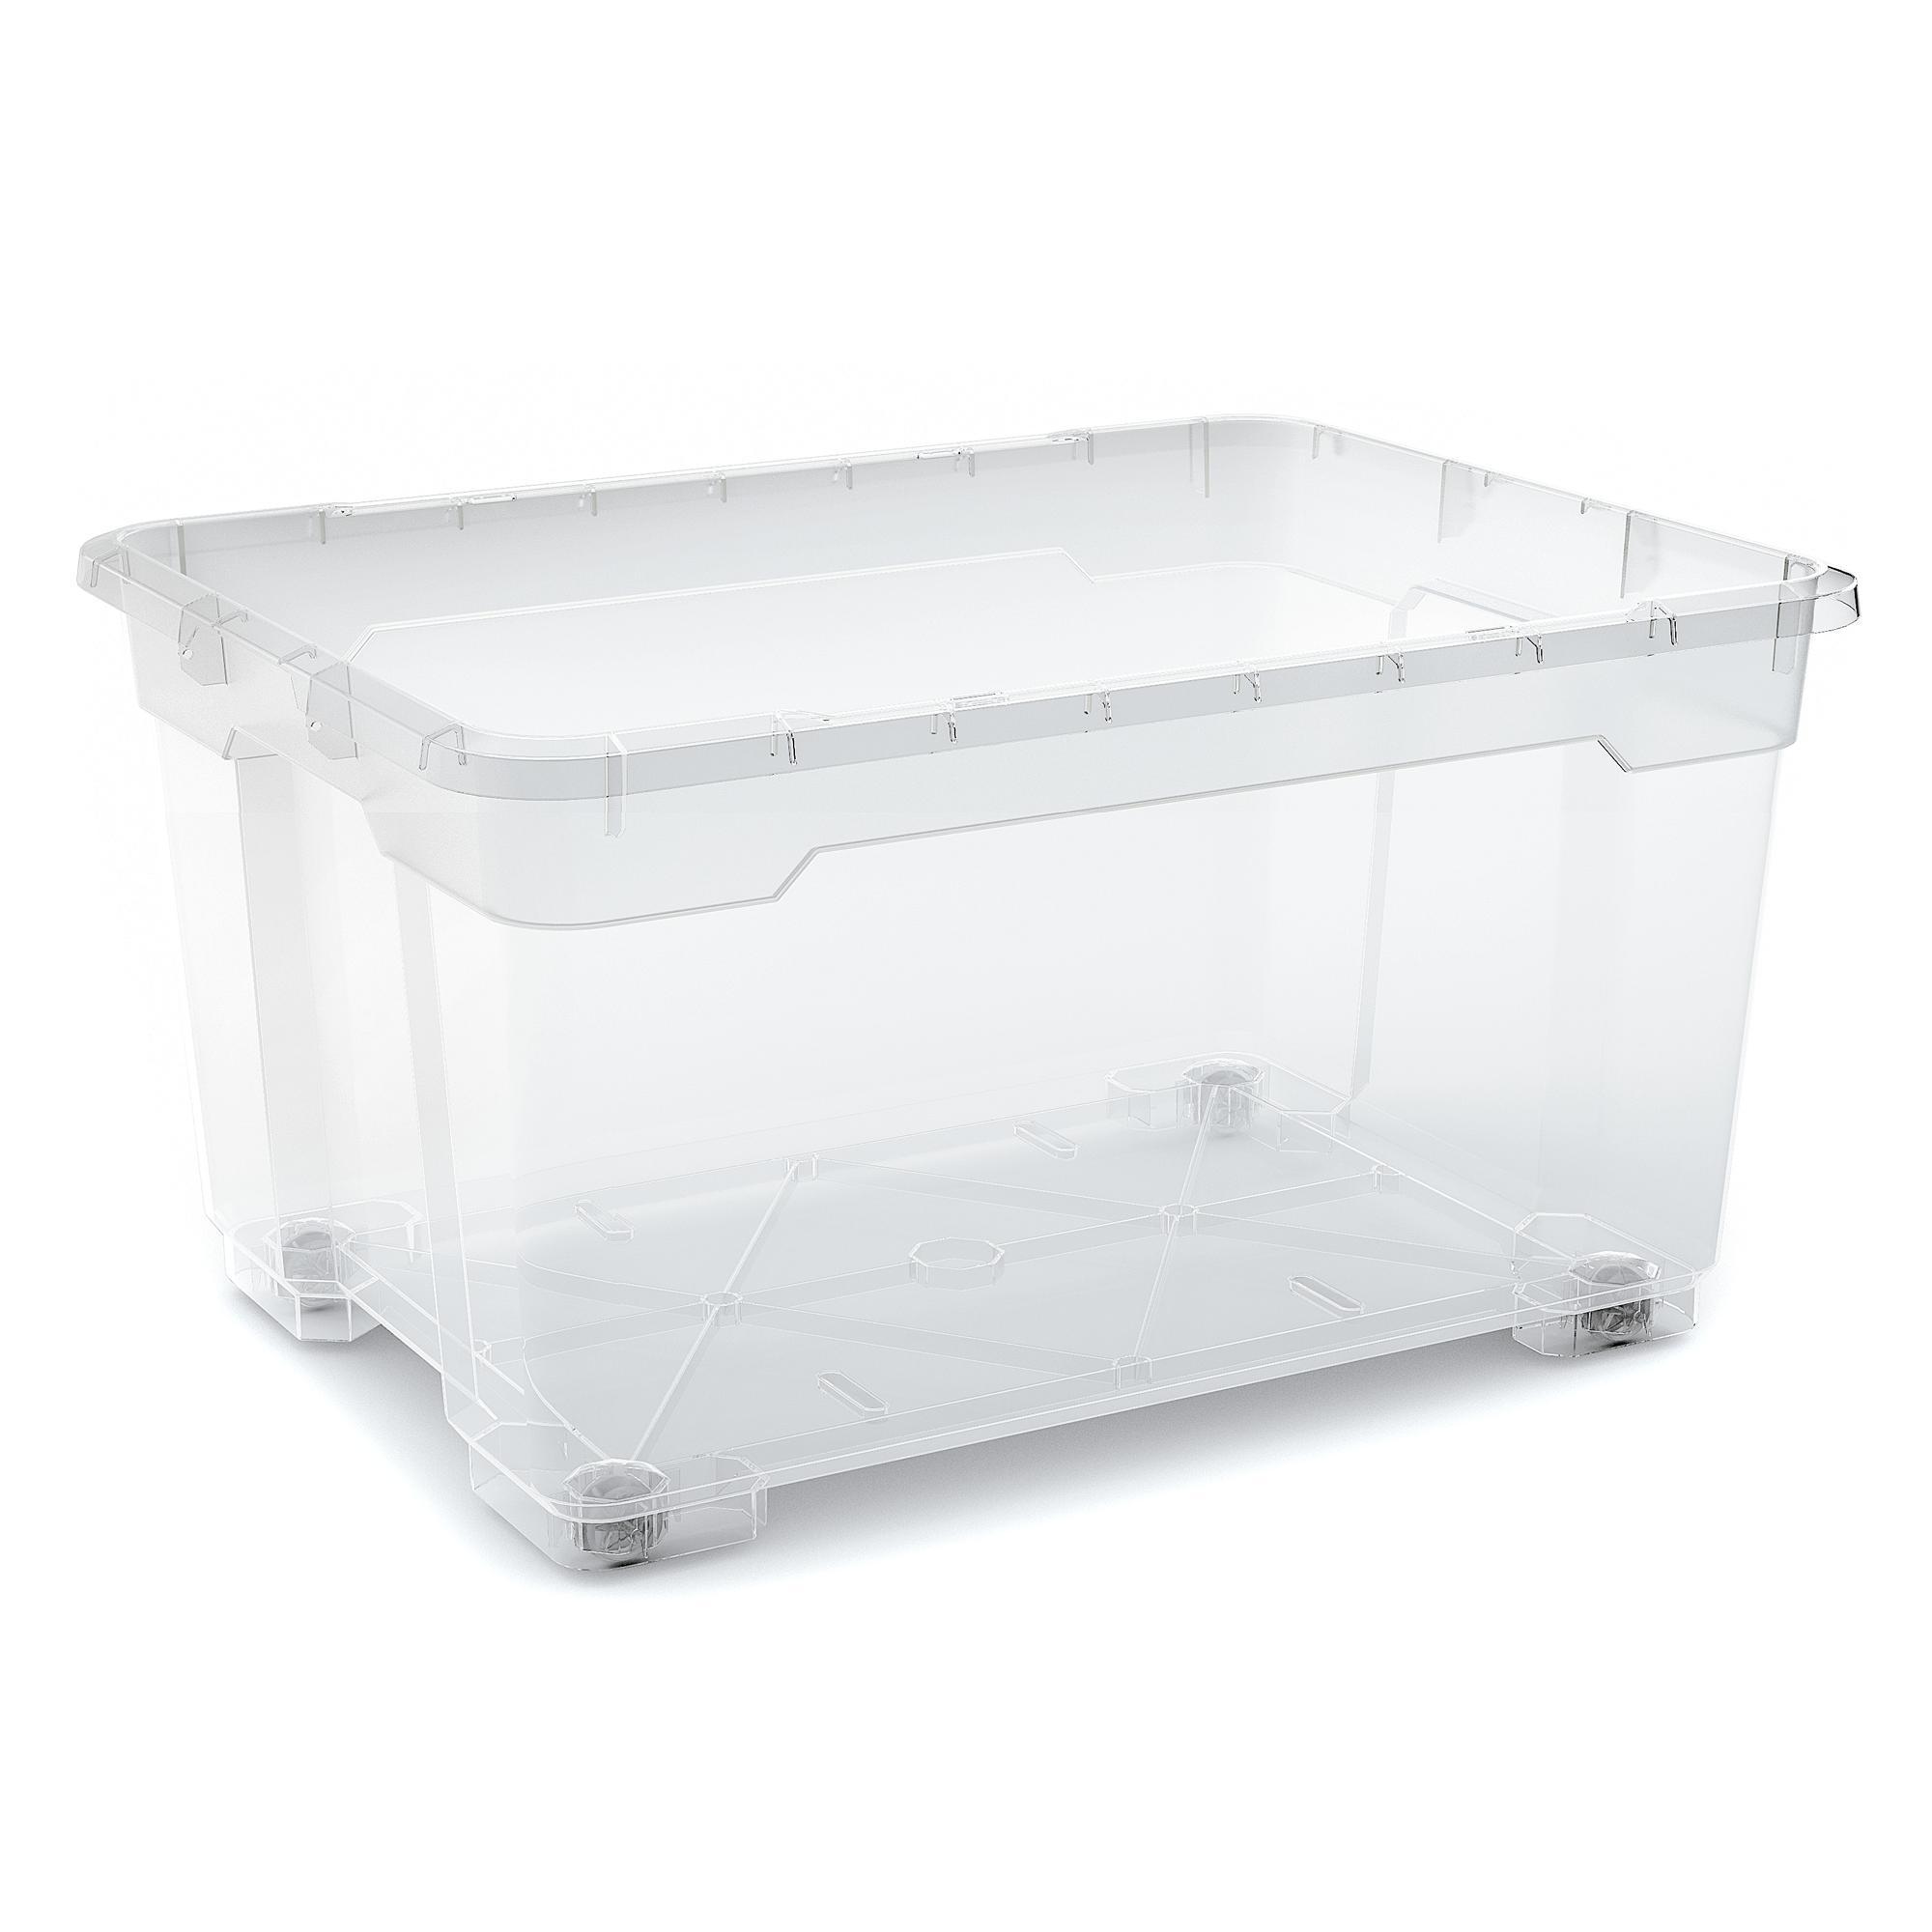 aufbewahrungsbox r box oversize transparent toom baumarkt. Black Bedroom Furniture Sets. Home Design Ideas